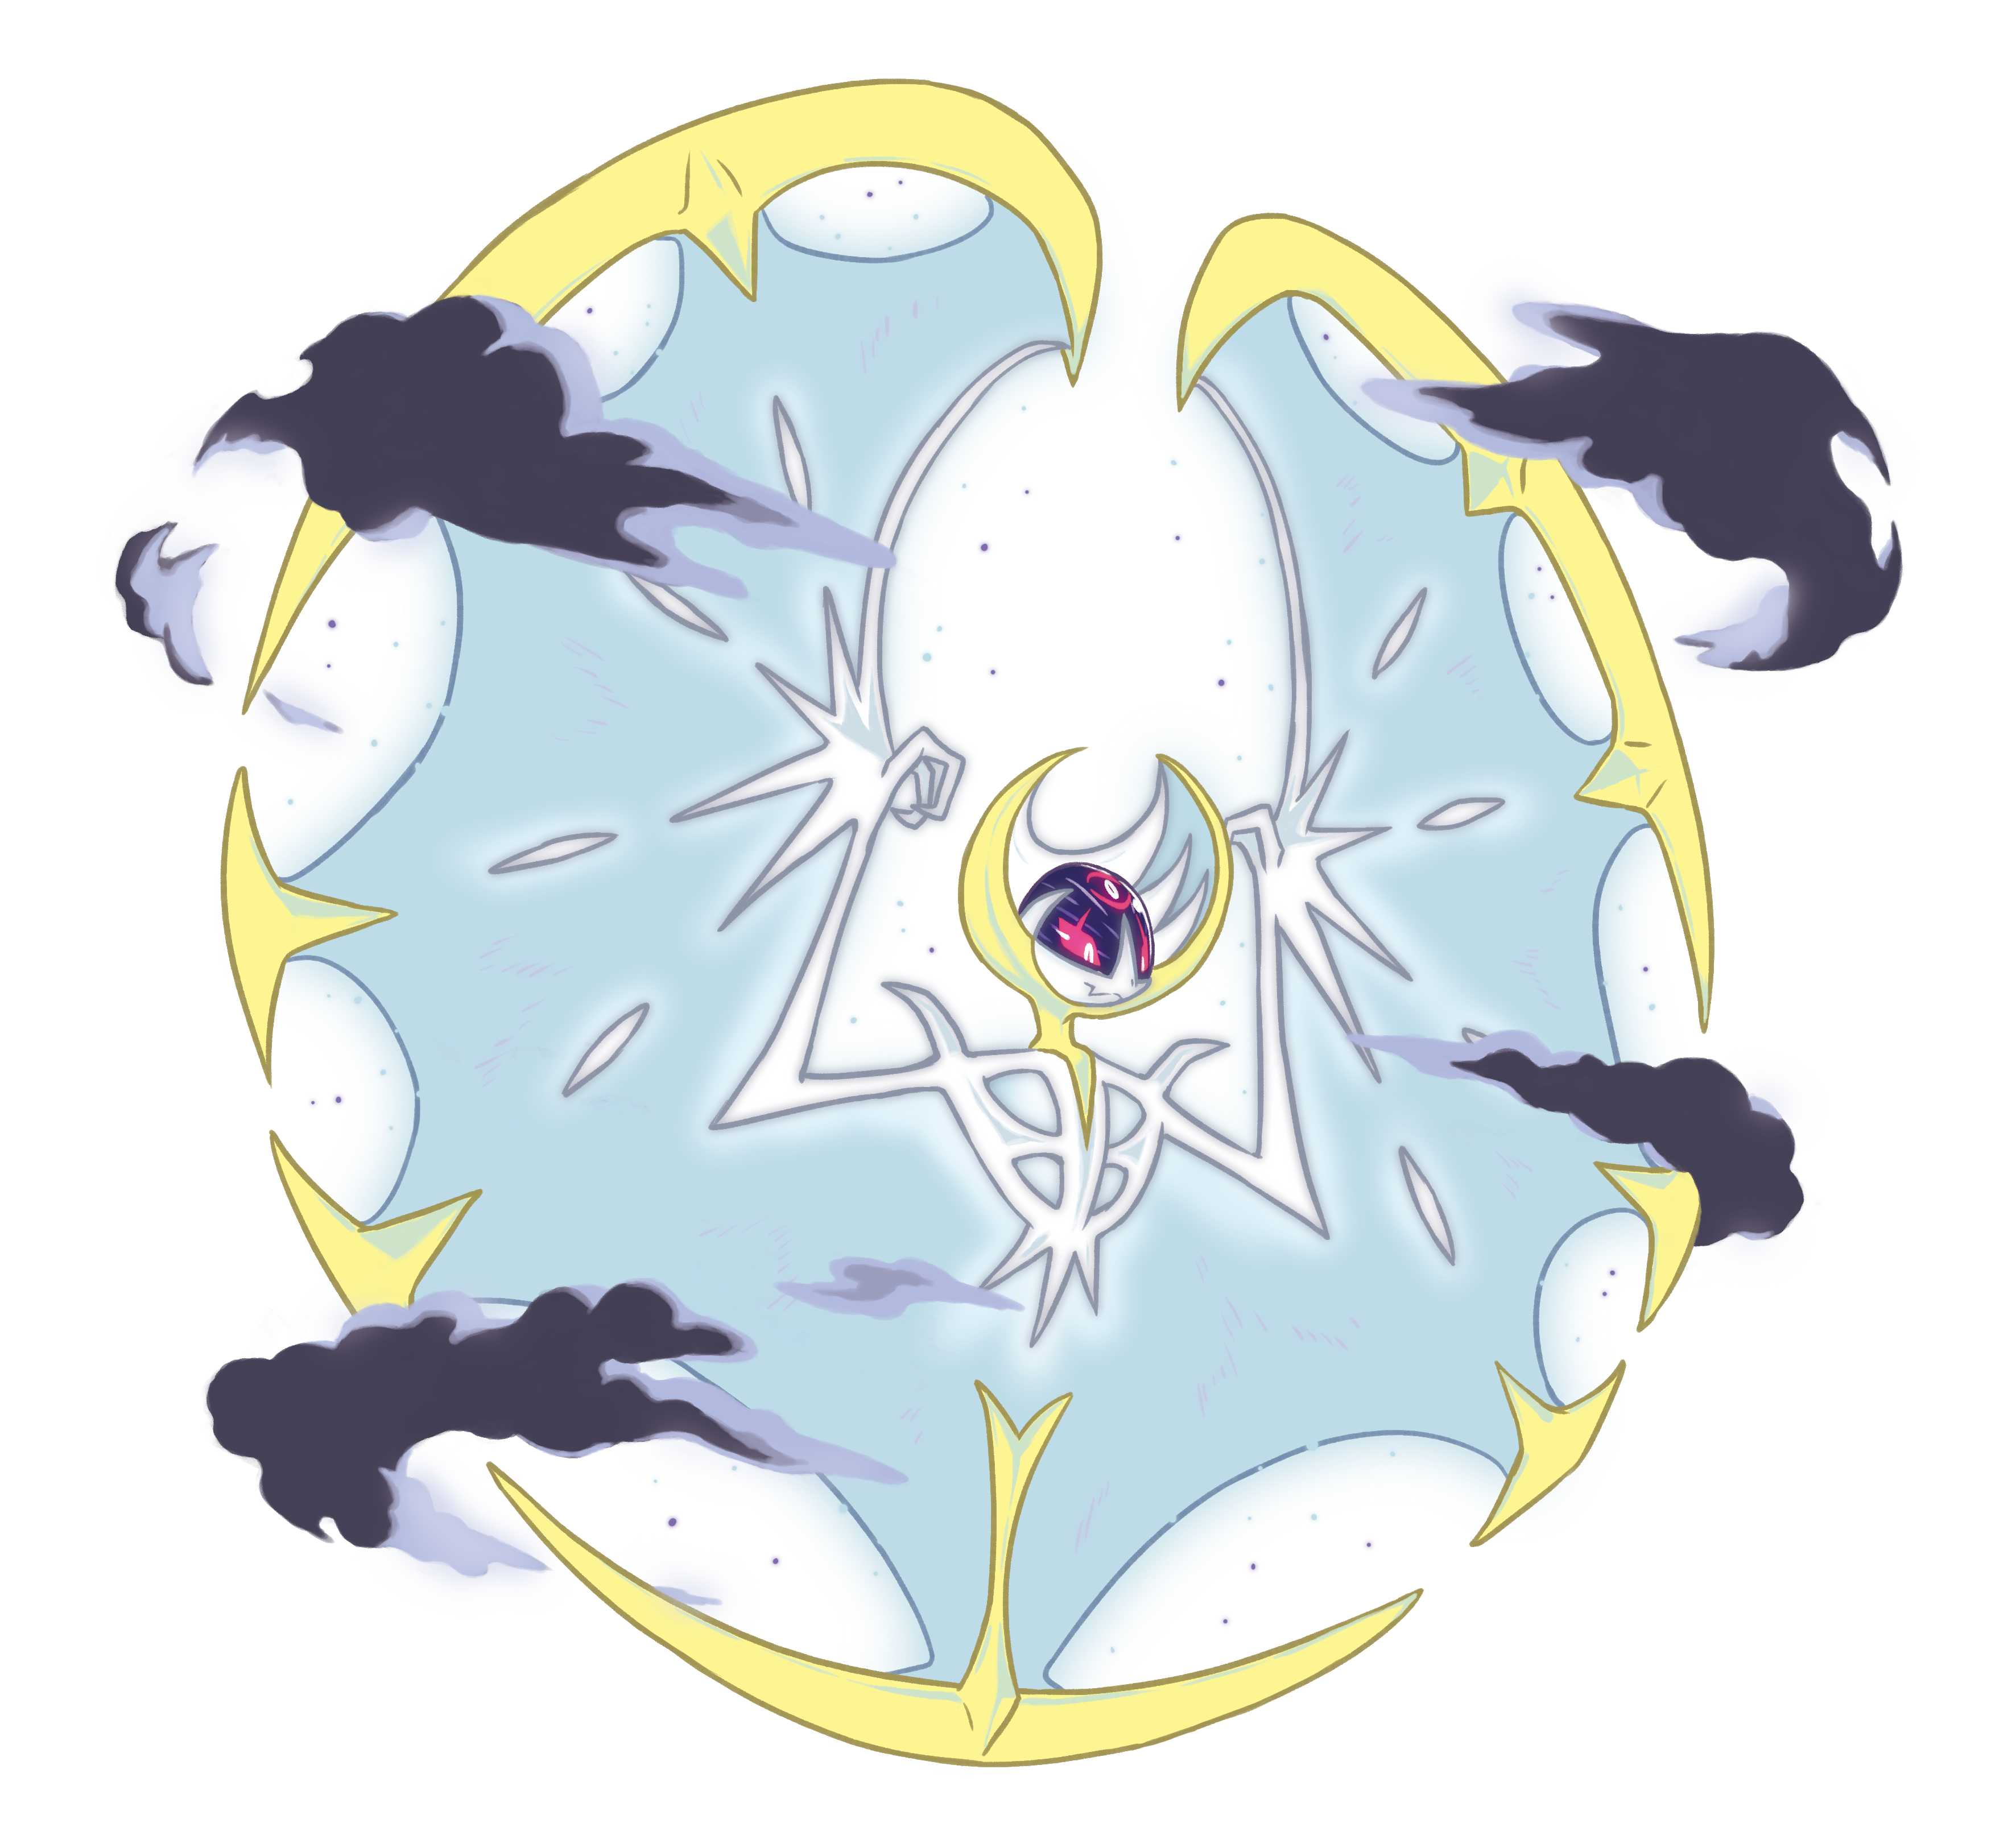 Pokemon Sun And Pokemon Moon ポケットモンスター サン ムーン